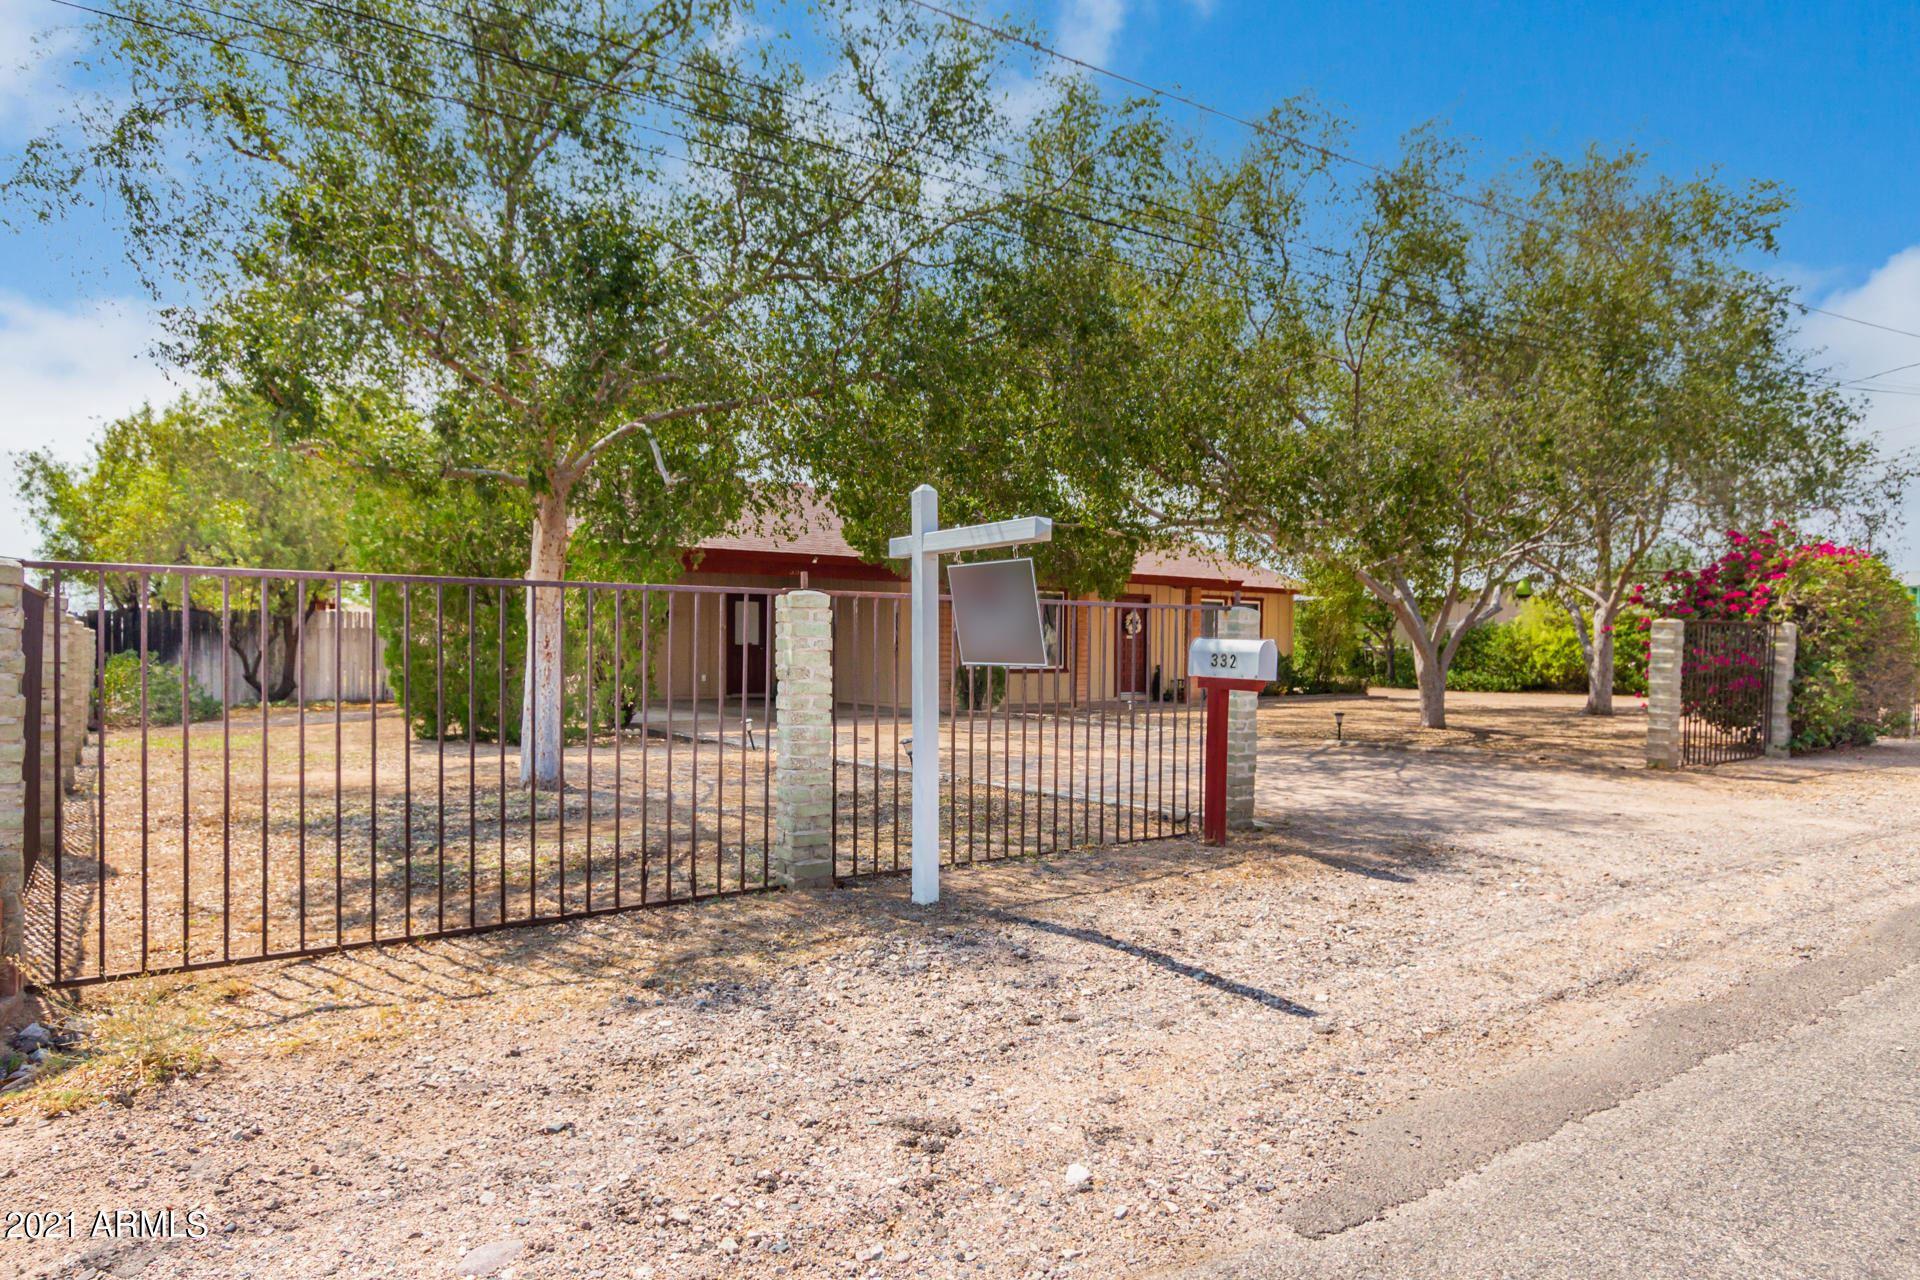 Photo of 332 S MALCOLM Drive, Apache Junction, AZ 85120 (MLS # 6268384)